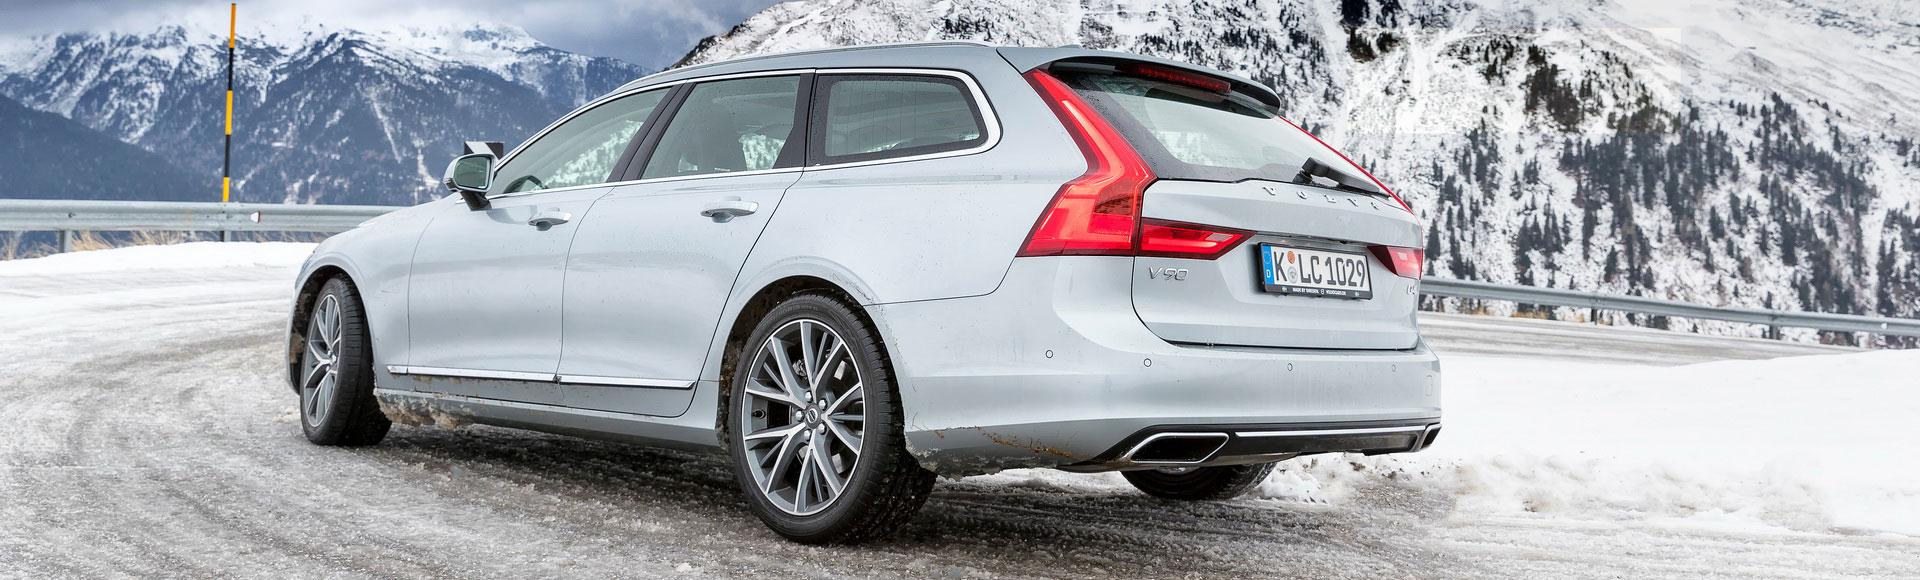 Volvo V90 2016 203 Winter